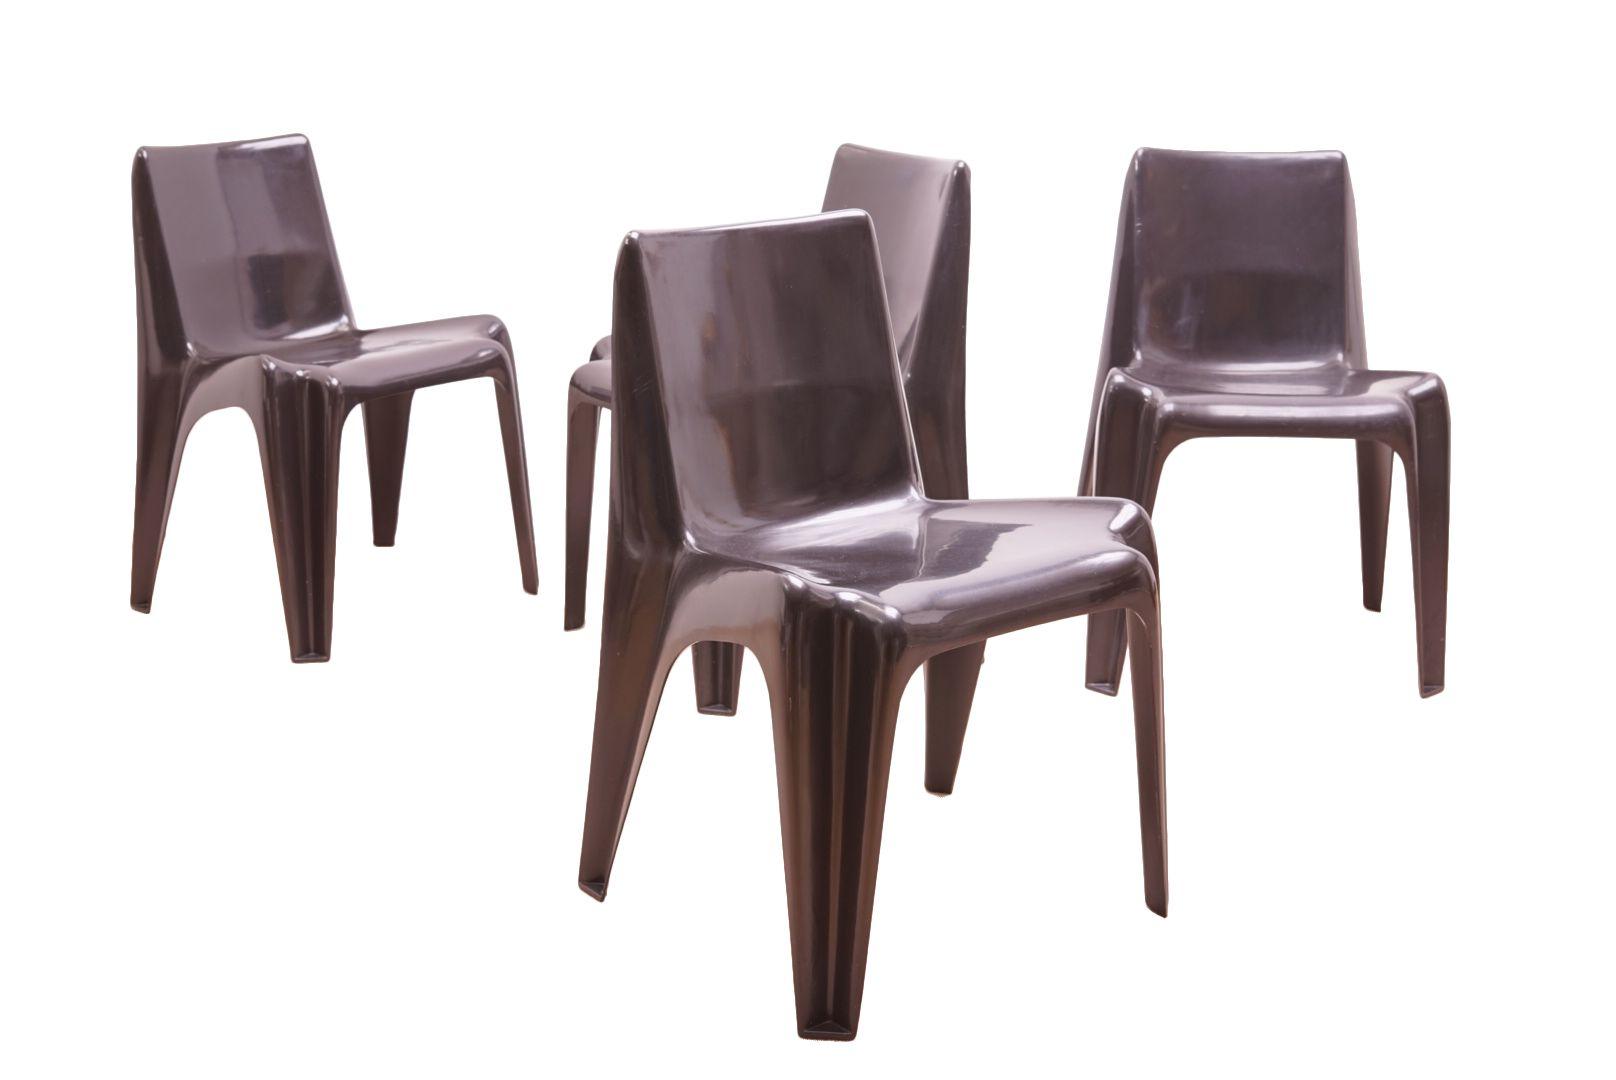 vintage st hle aus glasfaser von helmut b tzner f r. Black Bedroom Furniture Sets. Home Design Ideas